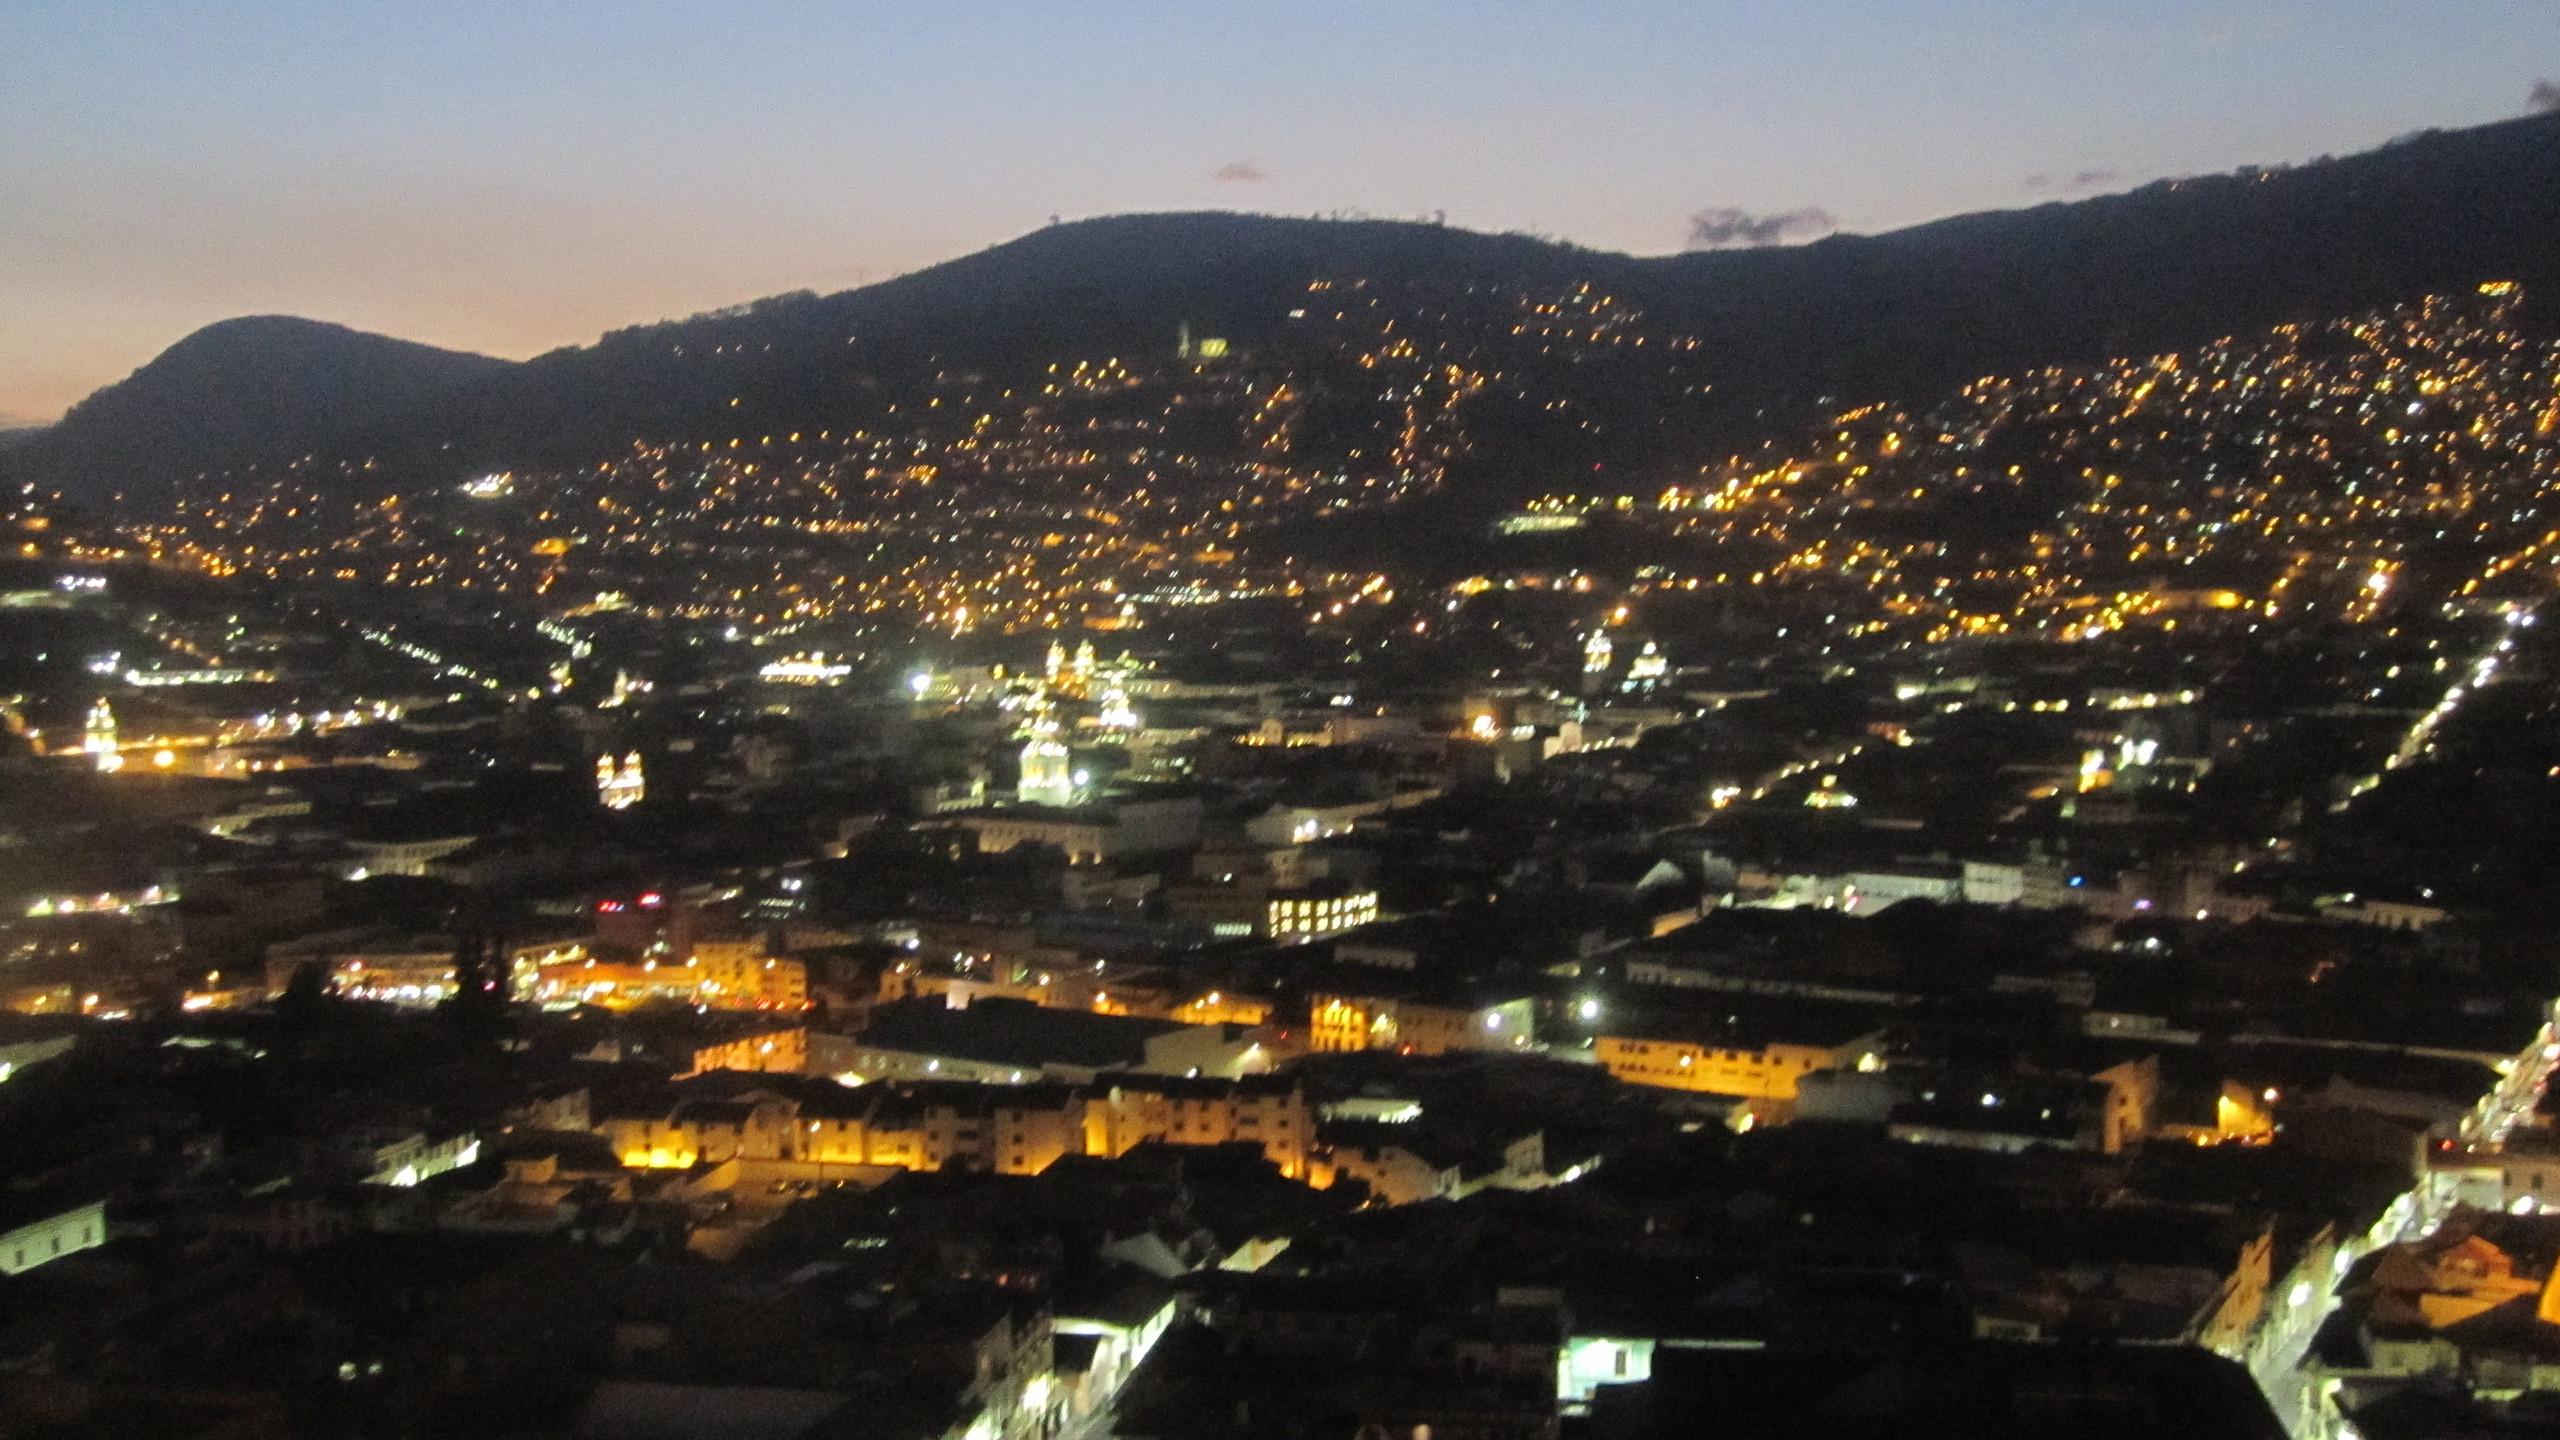 Final night in Quito